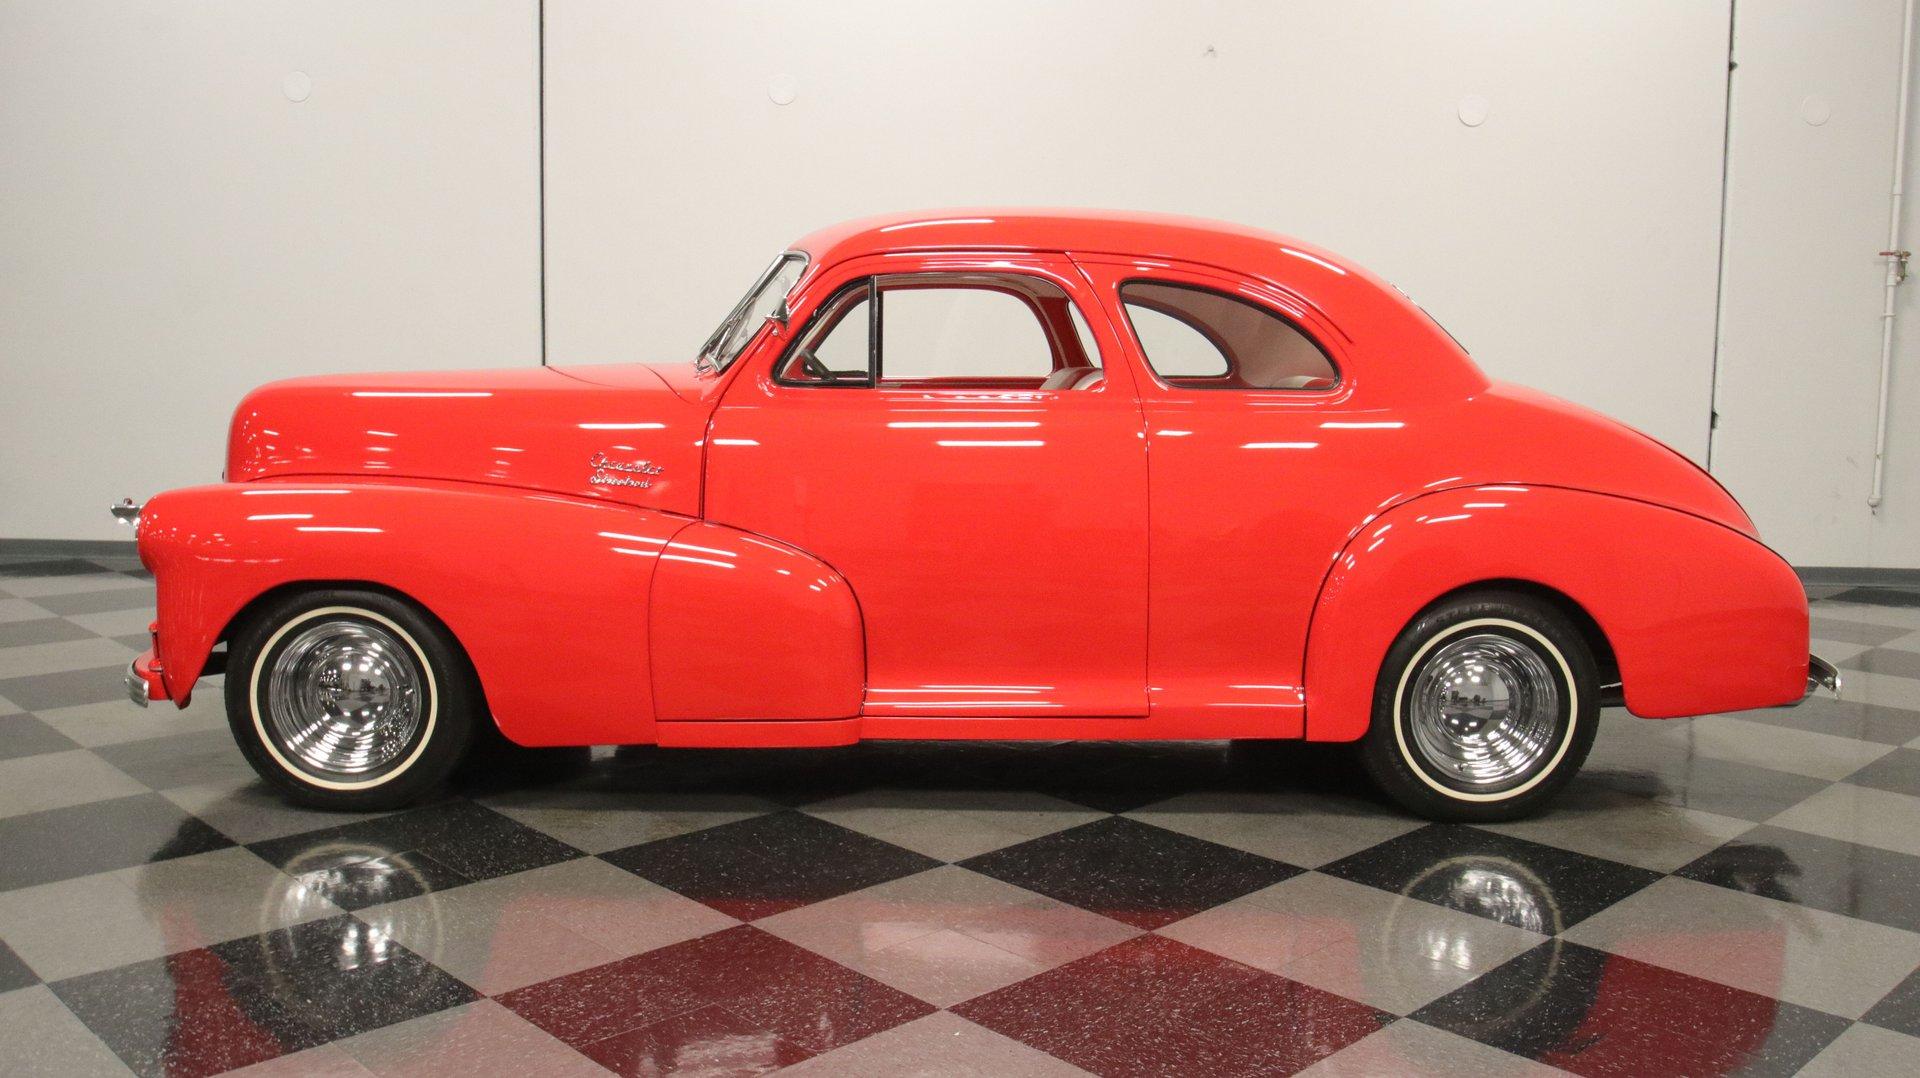 1948 chevrolet coupe street rod